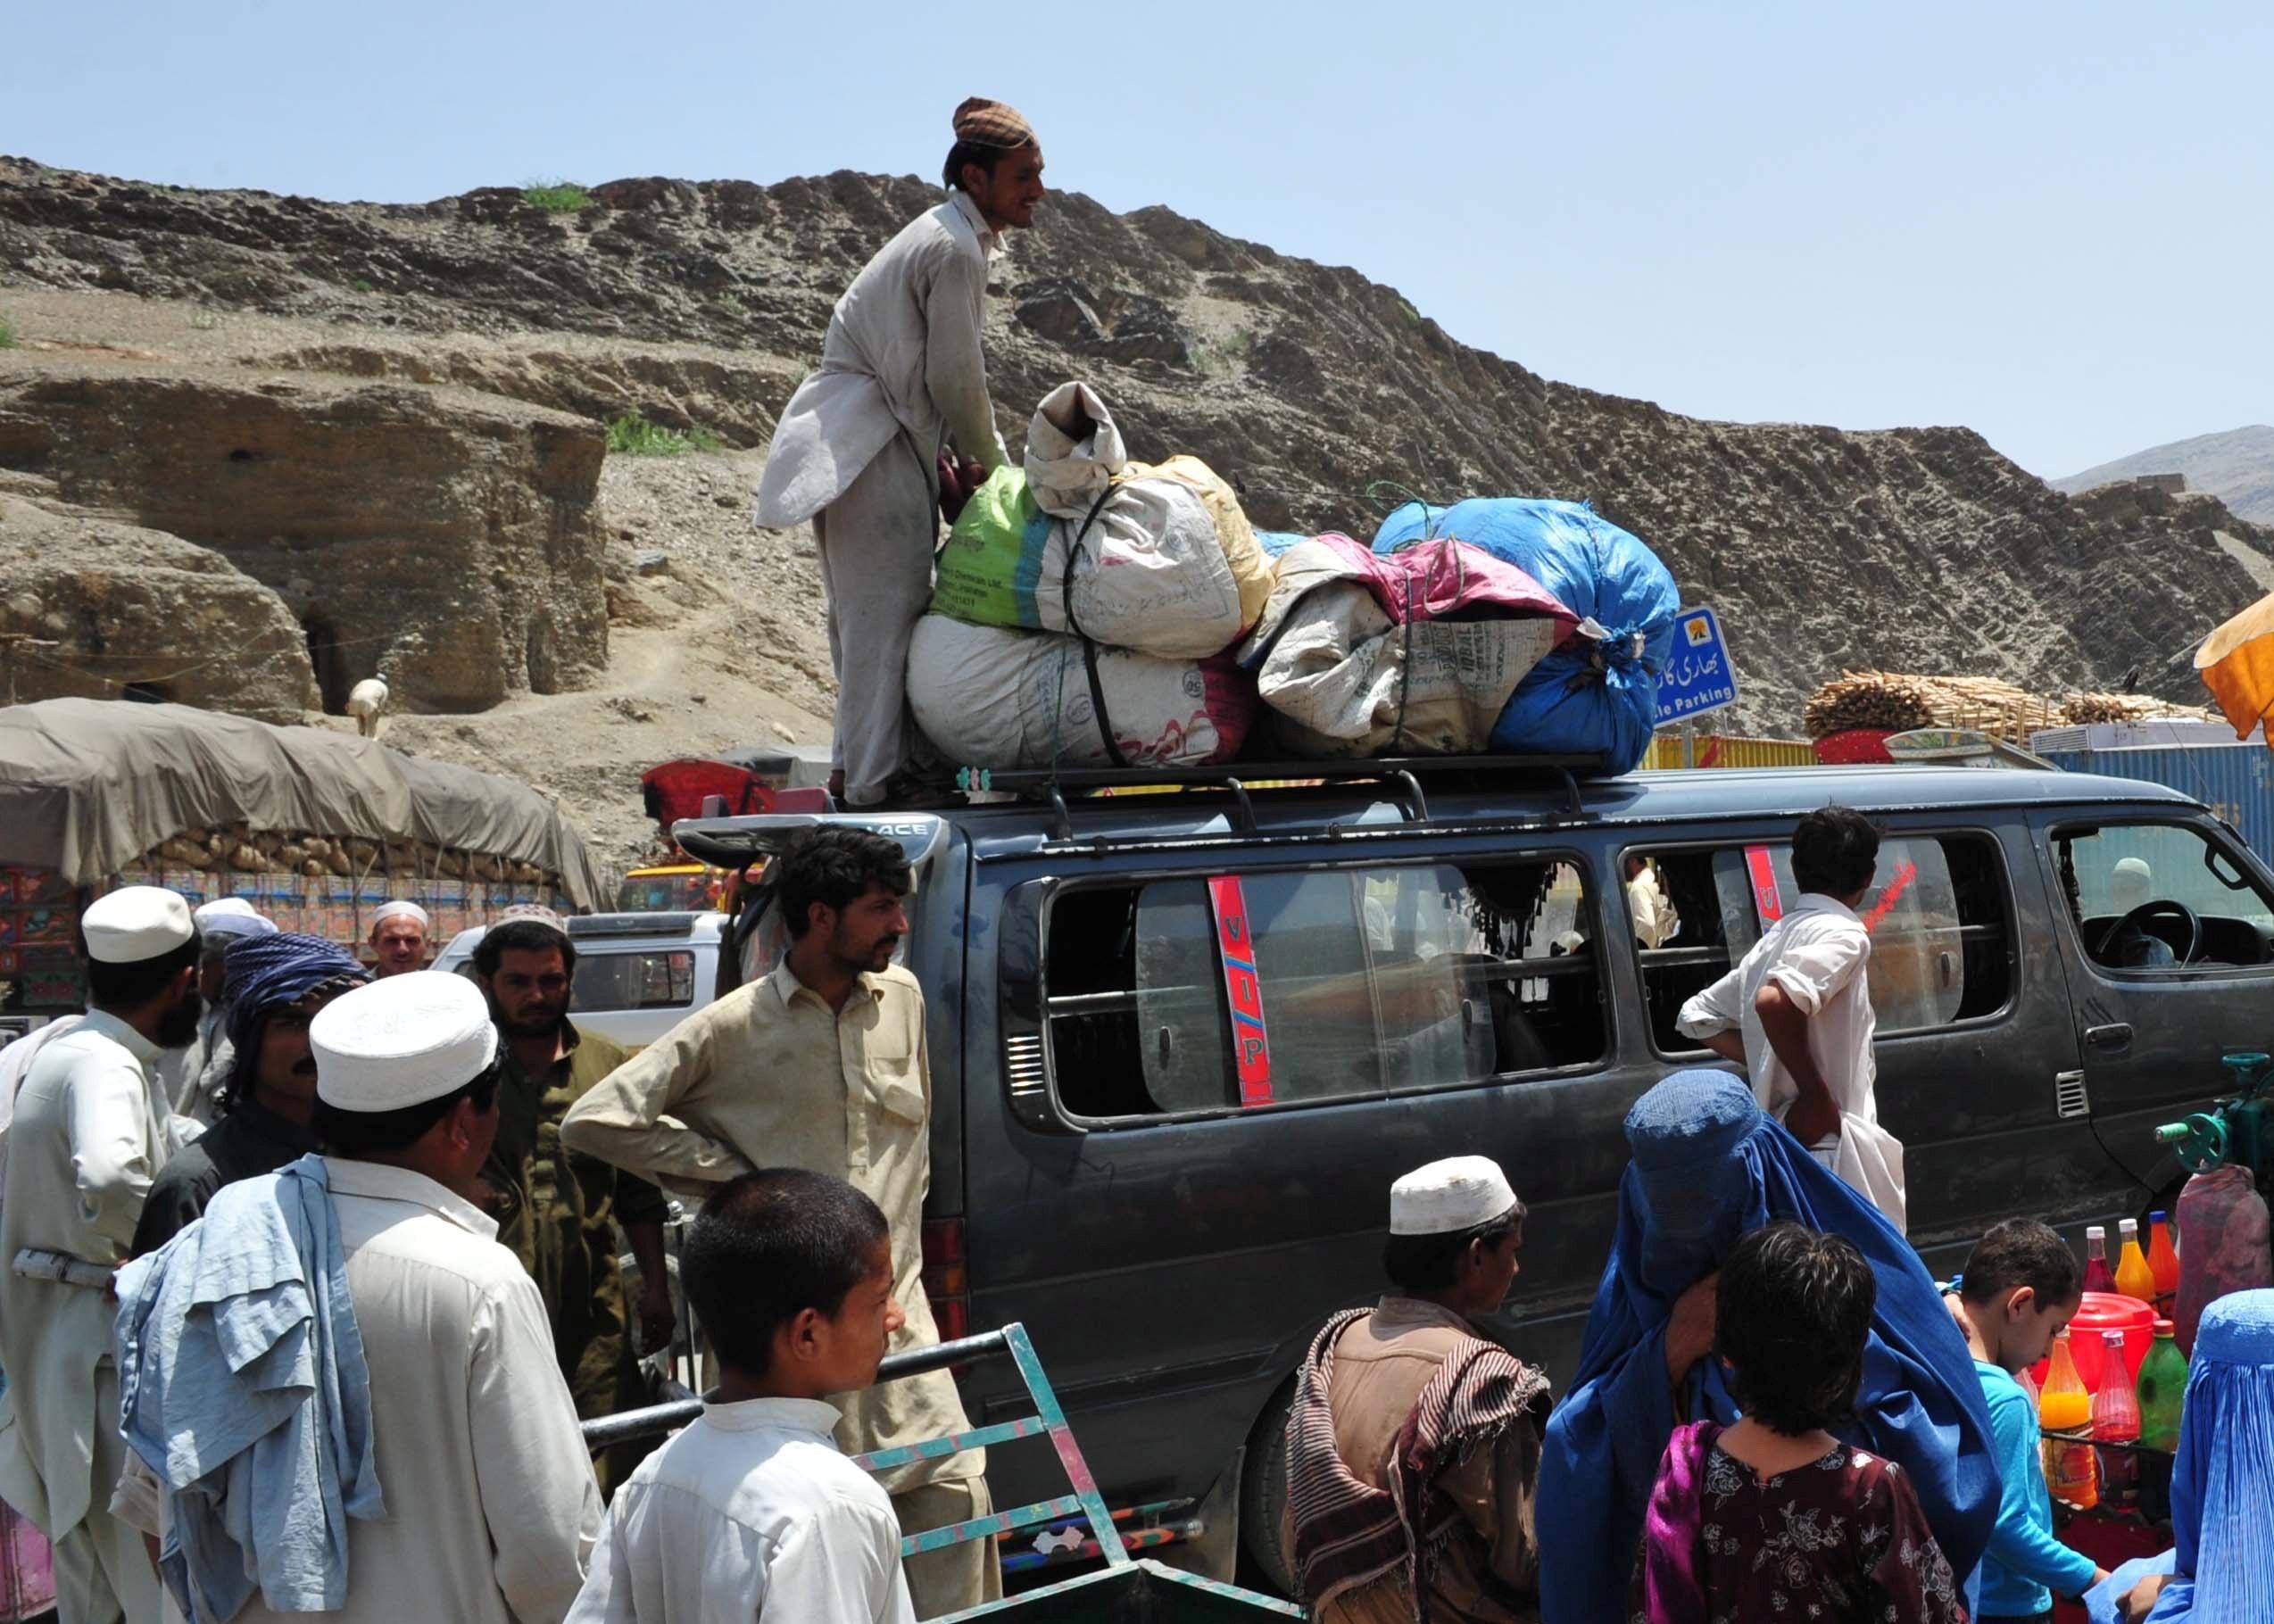 south waziristan tdps repatriation resumes today khyber news south waziristan tdps repatriation resumes today khyber news official website